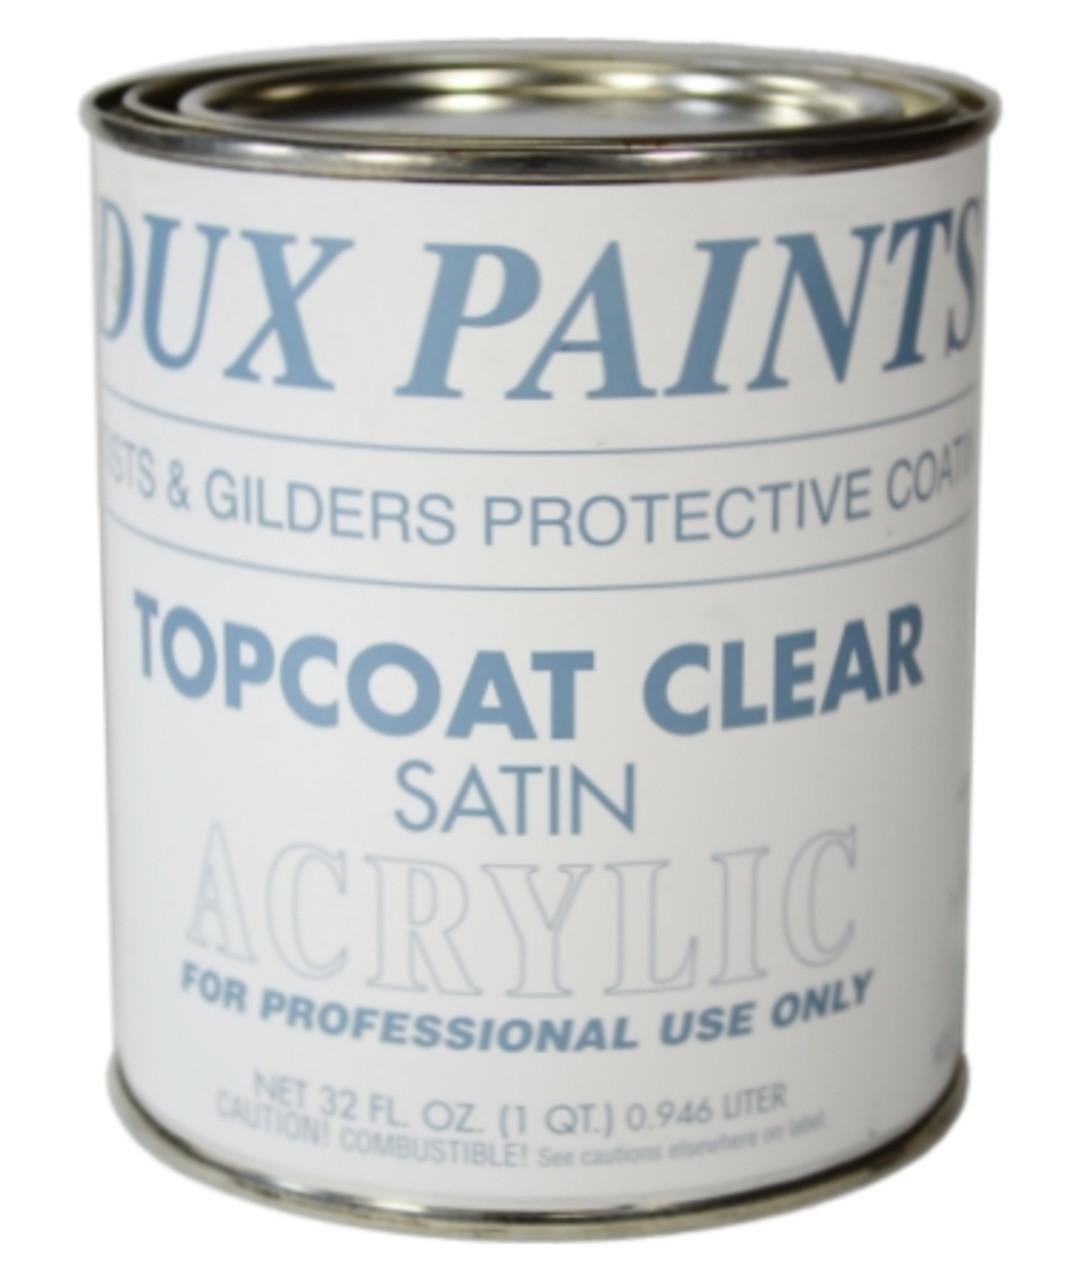 Topcoat Clear Satin, One Quart